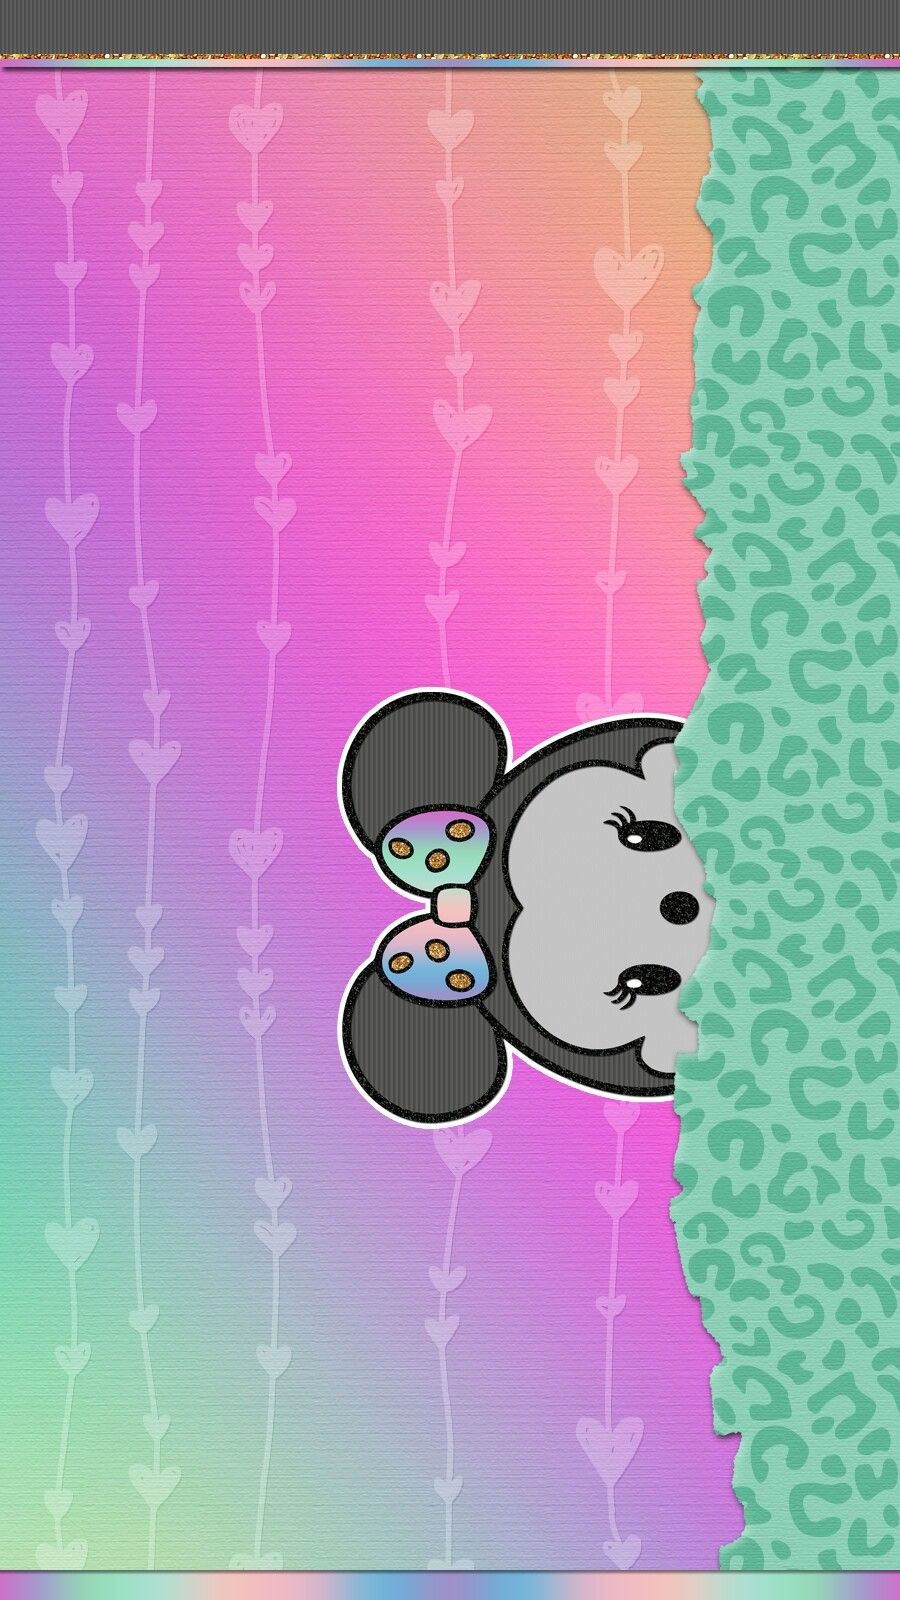 Minnie Tsum Tsum wallpaper iphone Cute walls by me♡ in